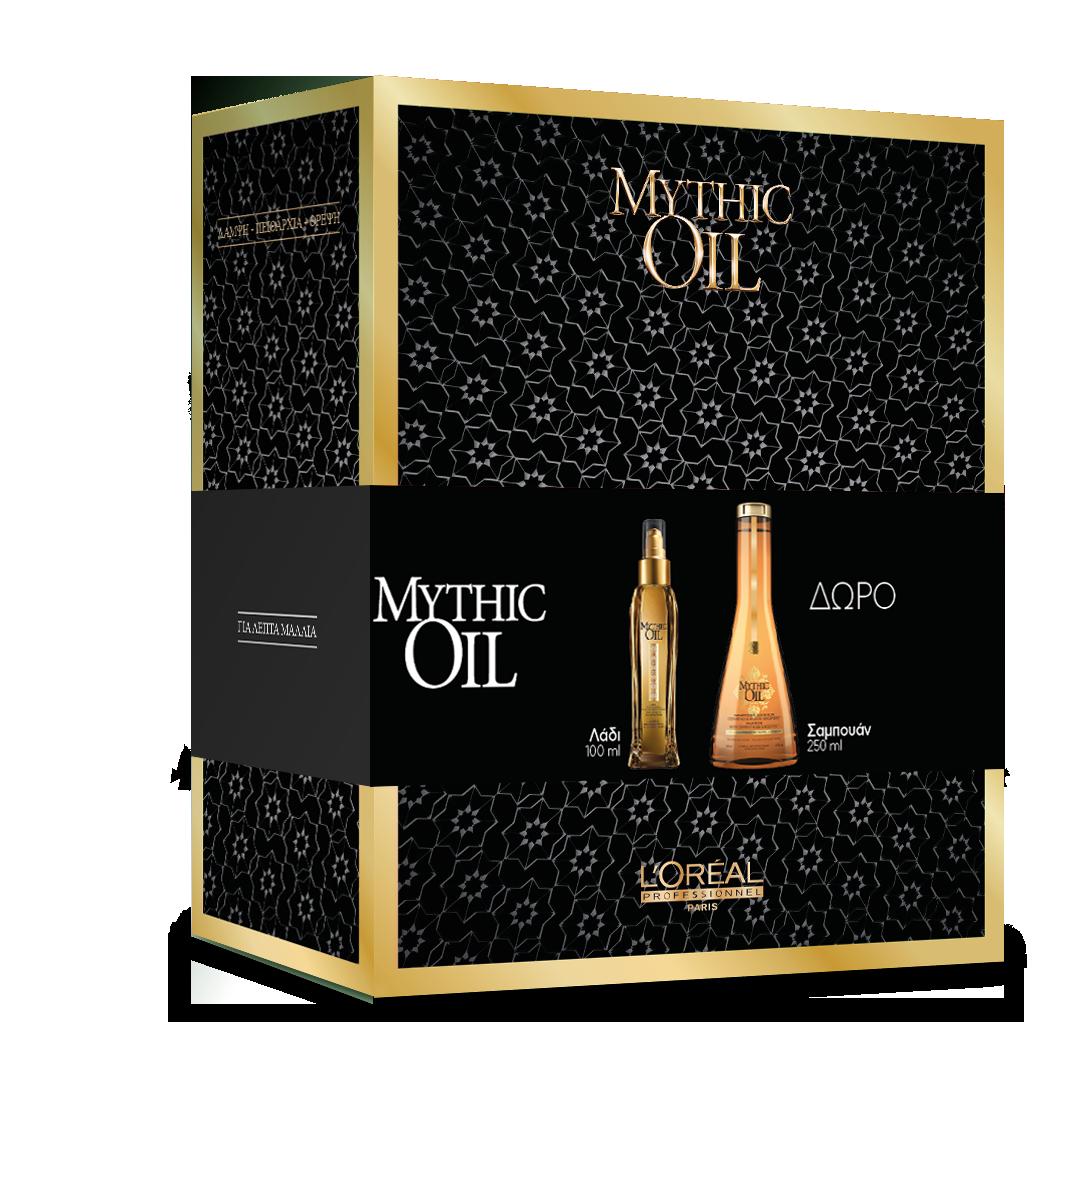 Mythic Oil σετ ( Ελαιο μαλλιών 100ml   Σαμπουάν για λεπτά μαλλιά 250ml) de50e0492ea